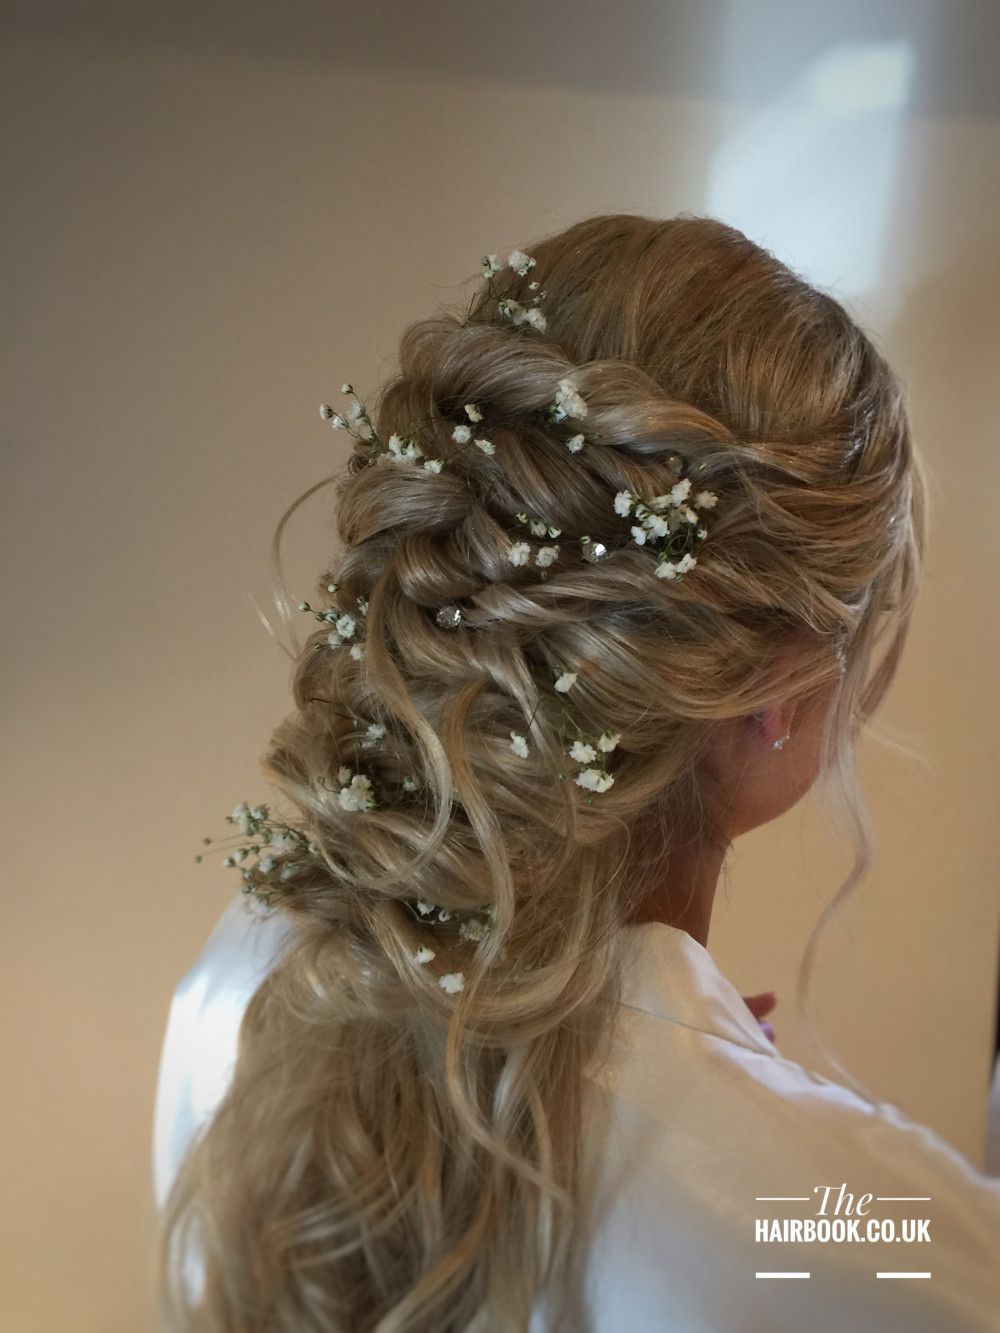 - Make Me Bridal Artist: The Hairbook. #bohemian #boho #flowercrown #halfuphair #curls #blonde #weddingmorning #elegant #hairup #fishtailbraid #loosecurls